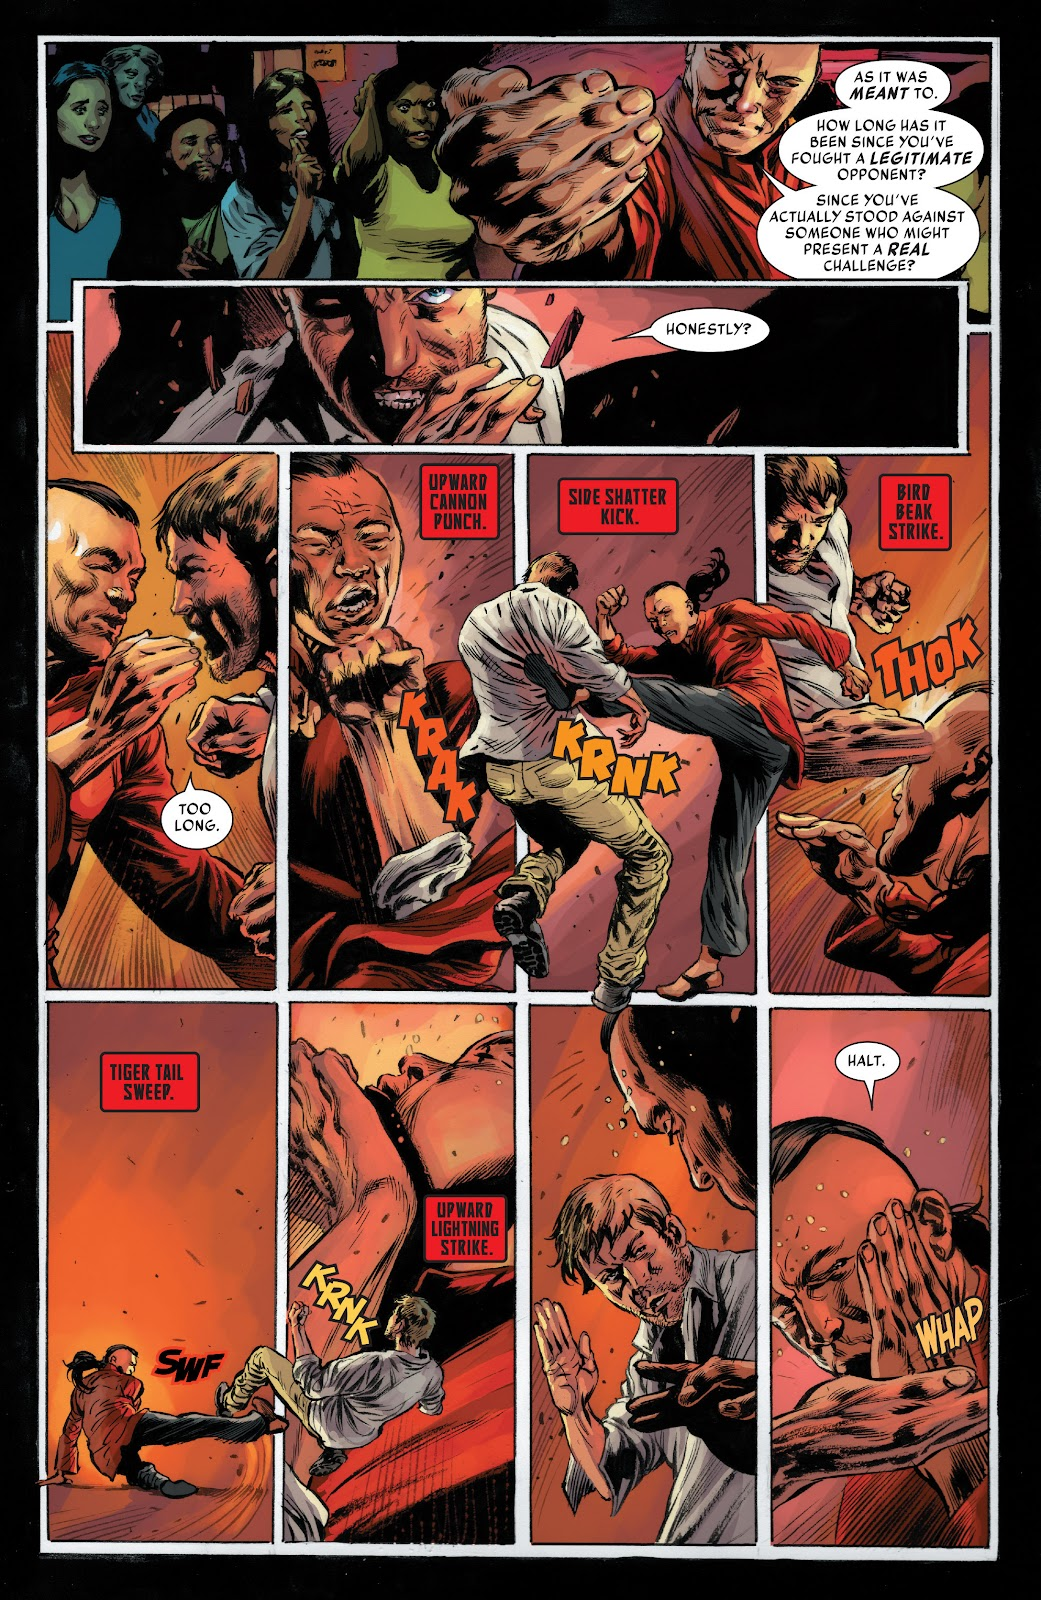 Iron Fist (2017) Issue #1 #1 - English 19